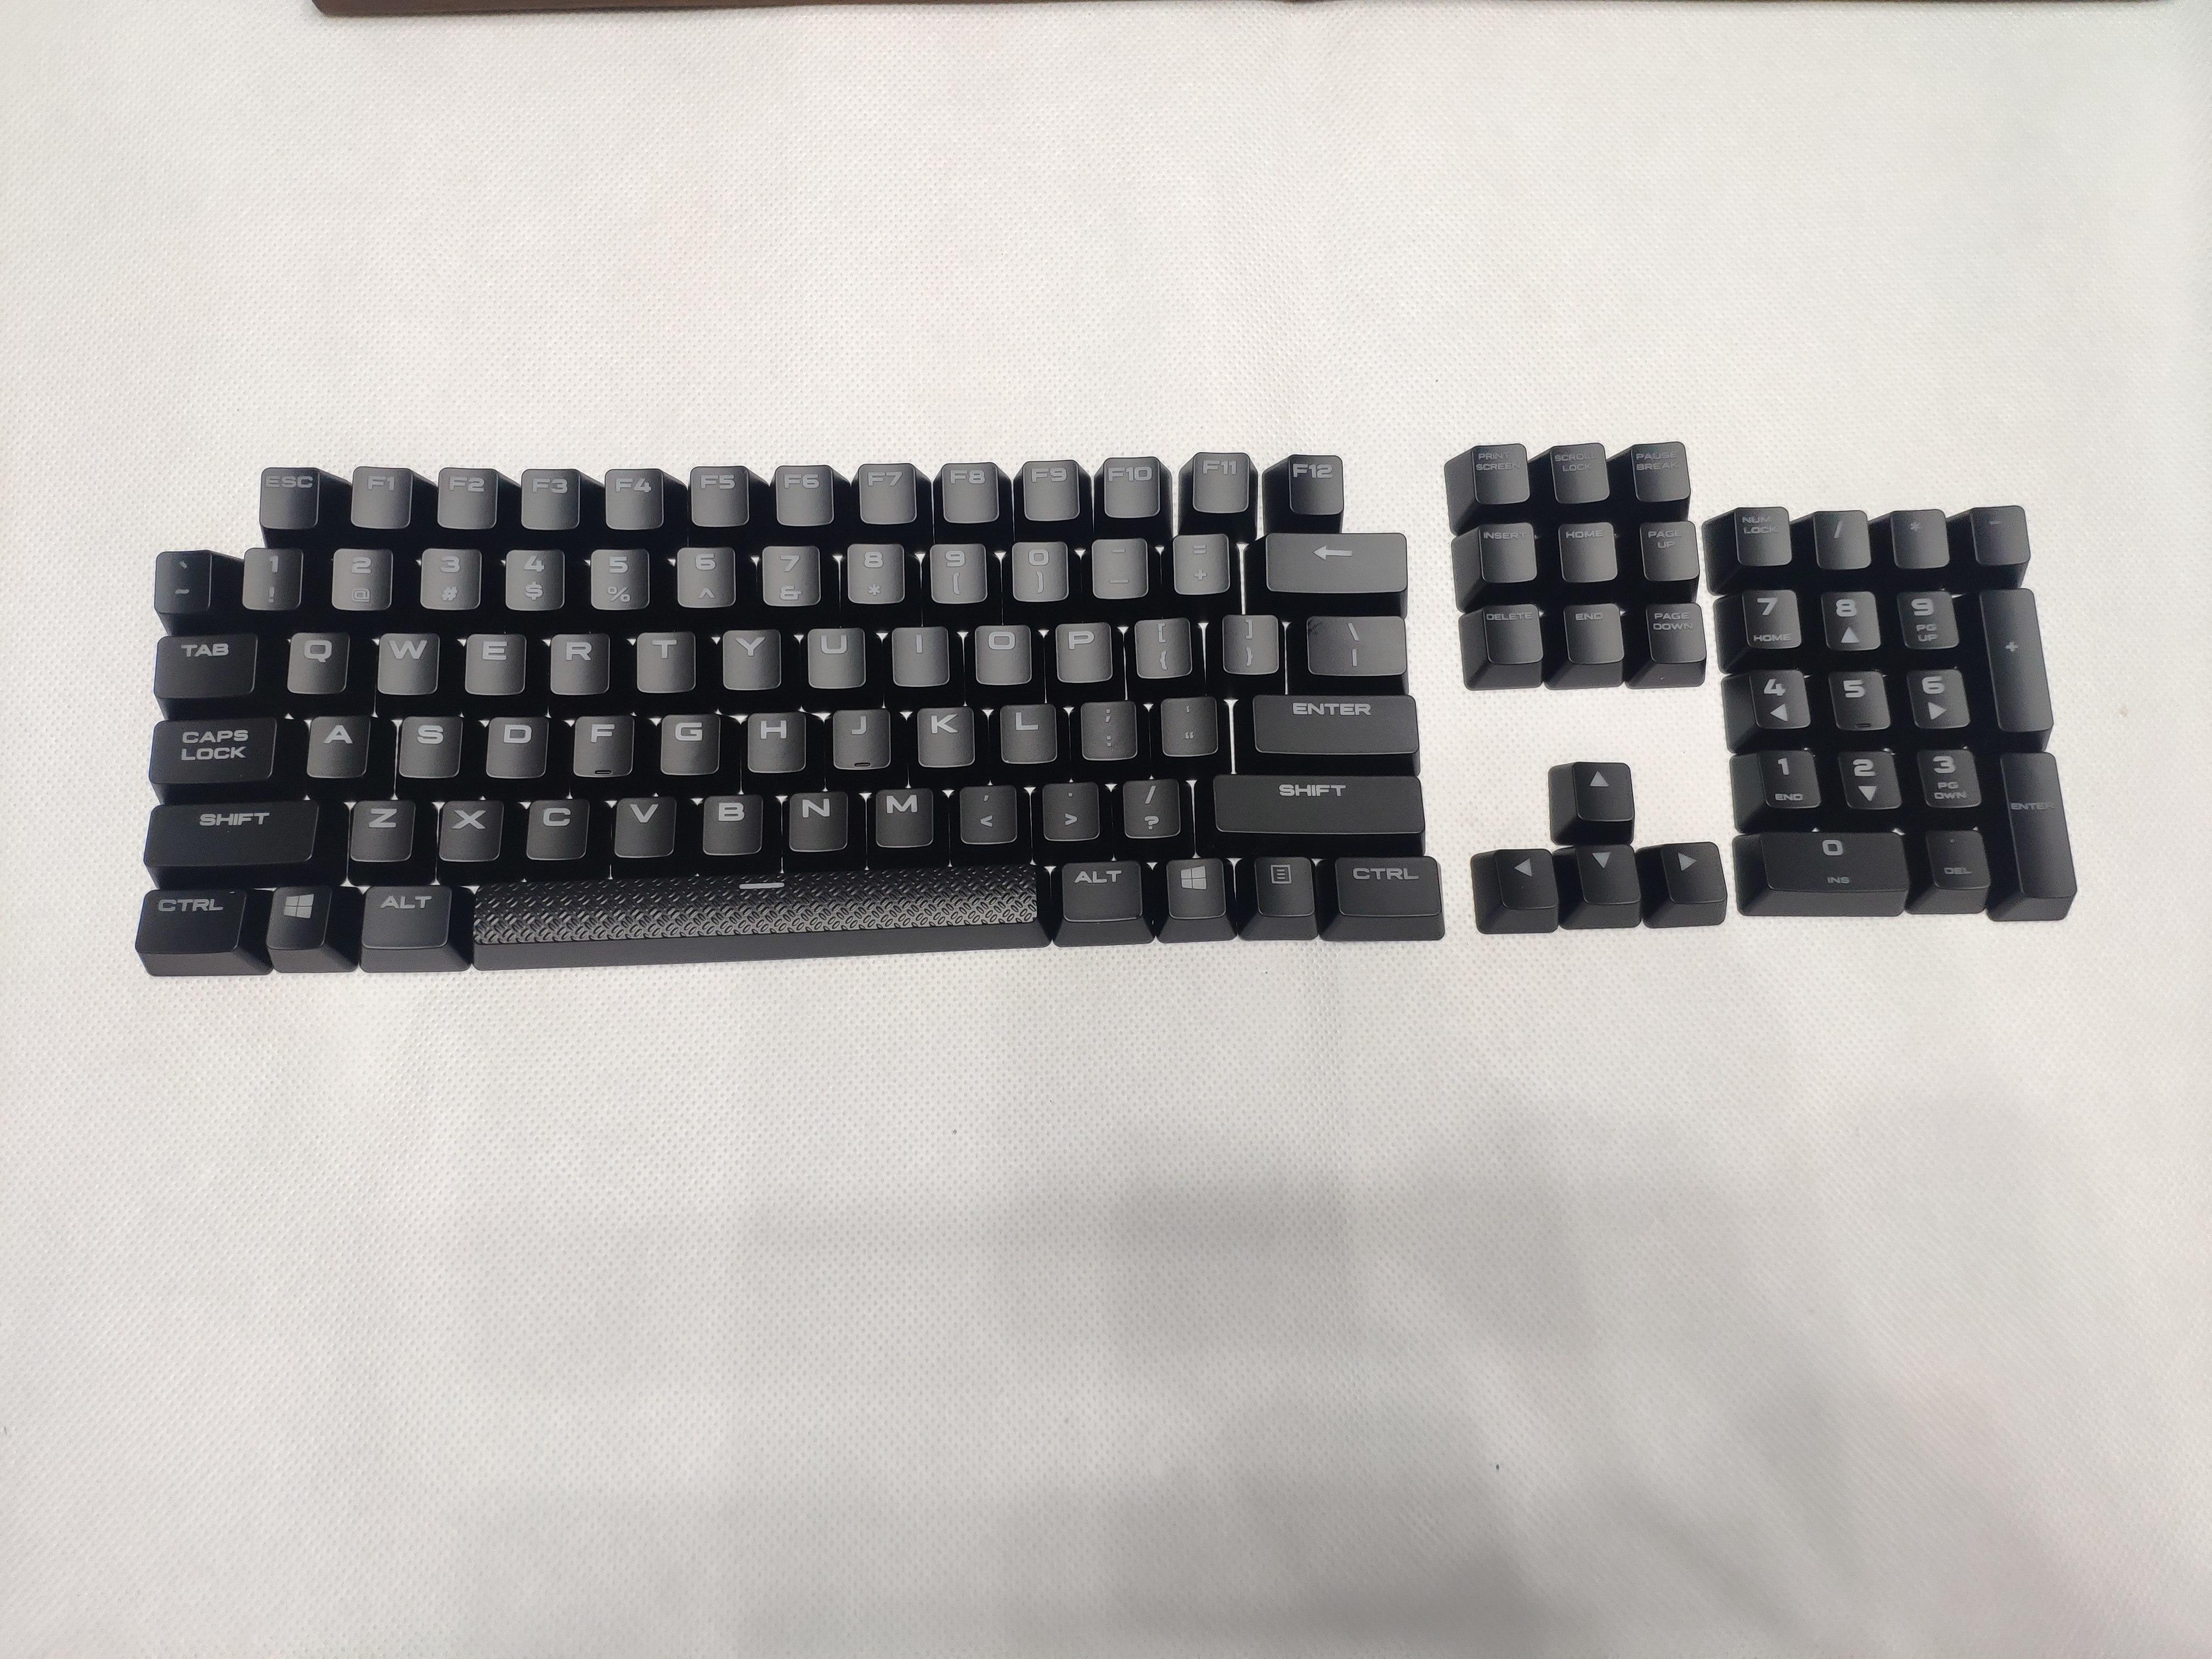 Original Key Caps For CORSAIR Mechanical Keyboard K70 LUX/K70 LUX RGB/K95 Single Key Cap Can Be Sold